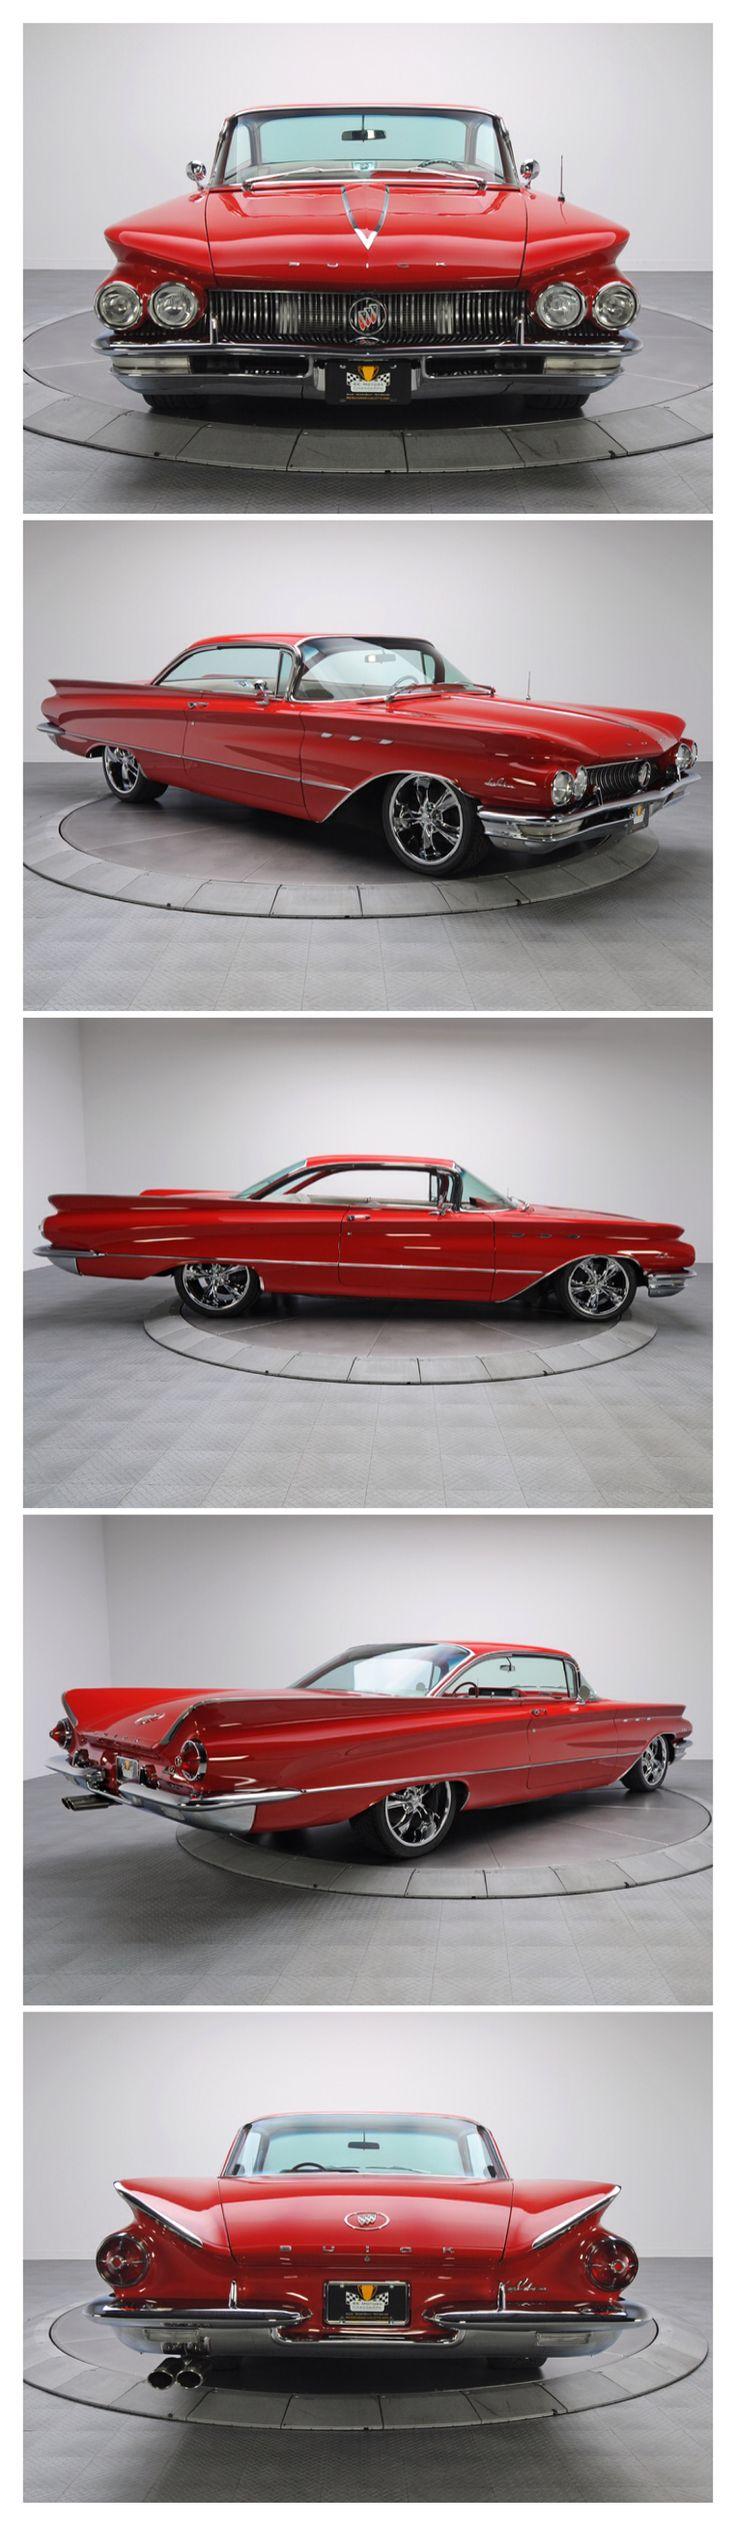 1960 Buick Lesabre                                                                                                                                                      More